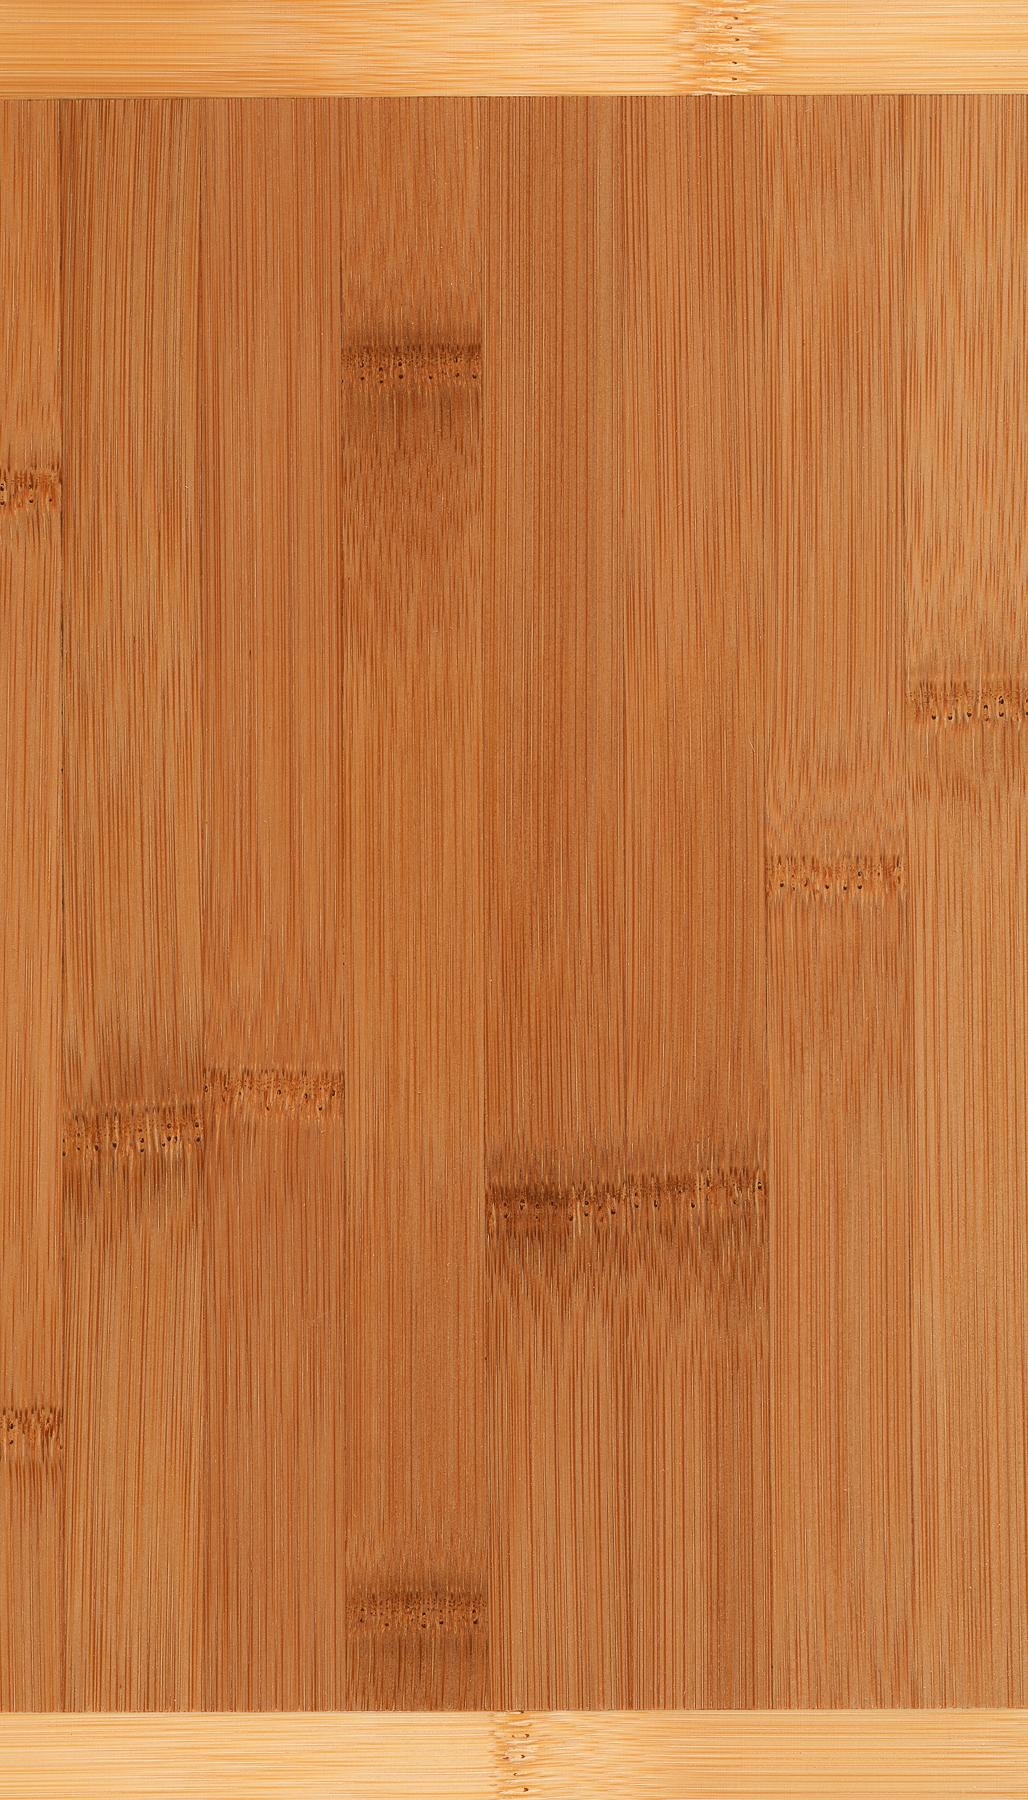 Wood Panels Texture, Align, Straight, Photo, Photograph, HQ Photo